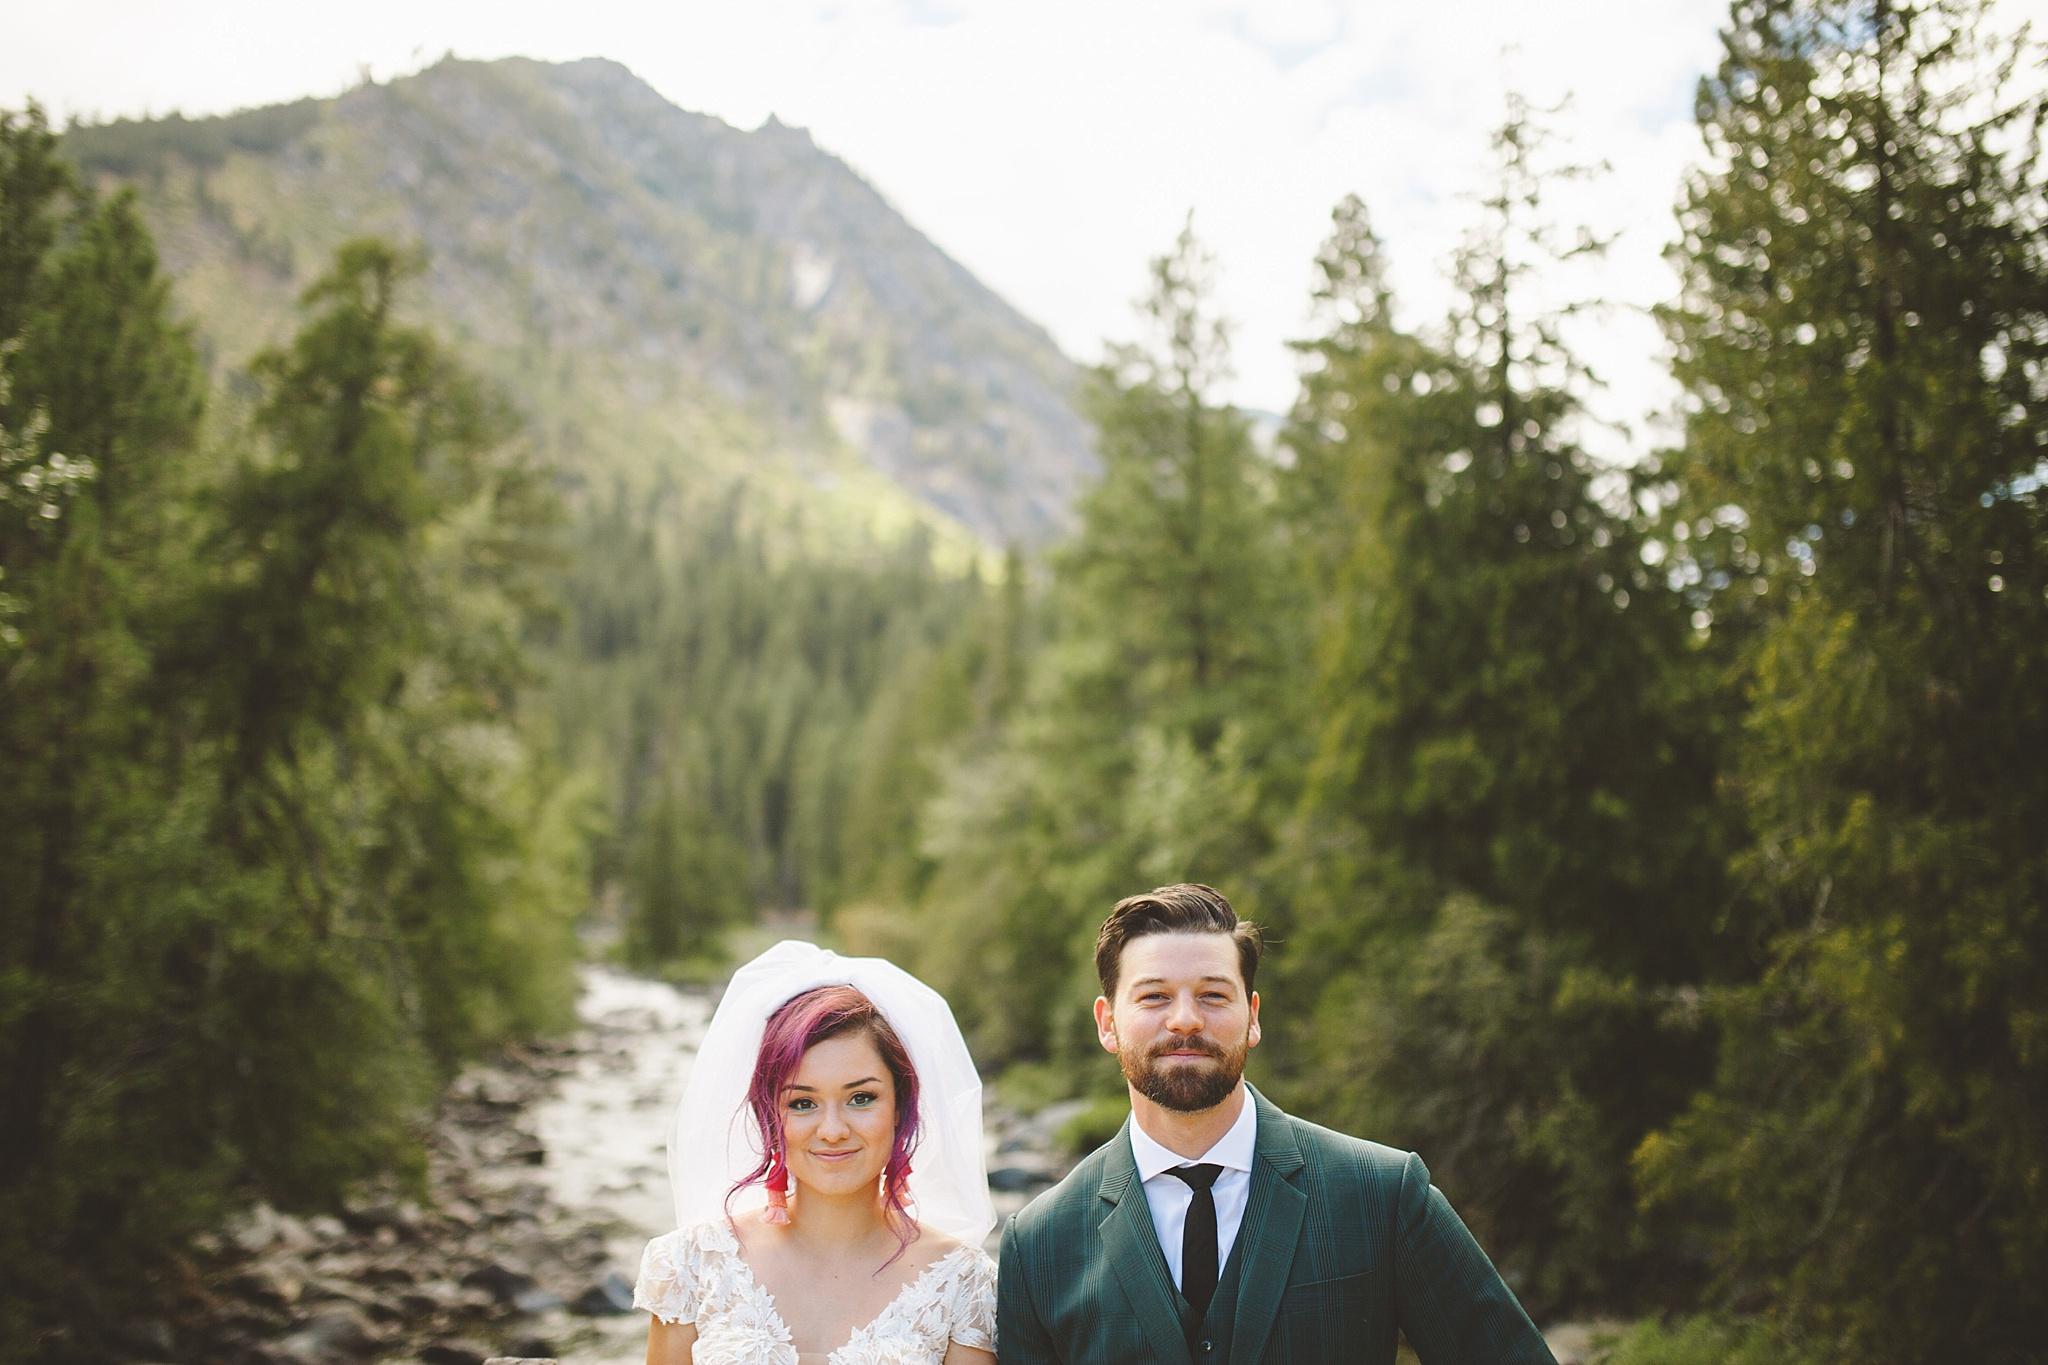 PNW washington wedding portraits in the woods